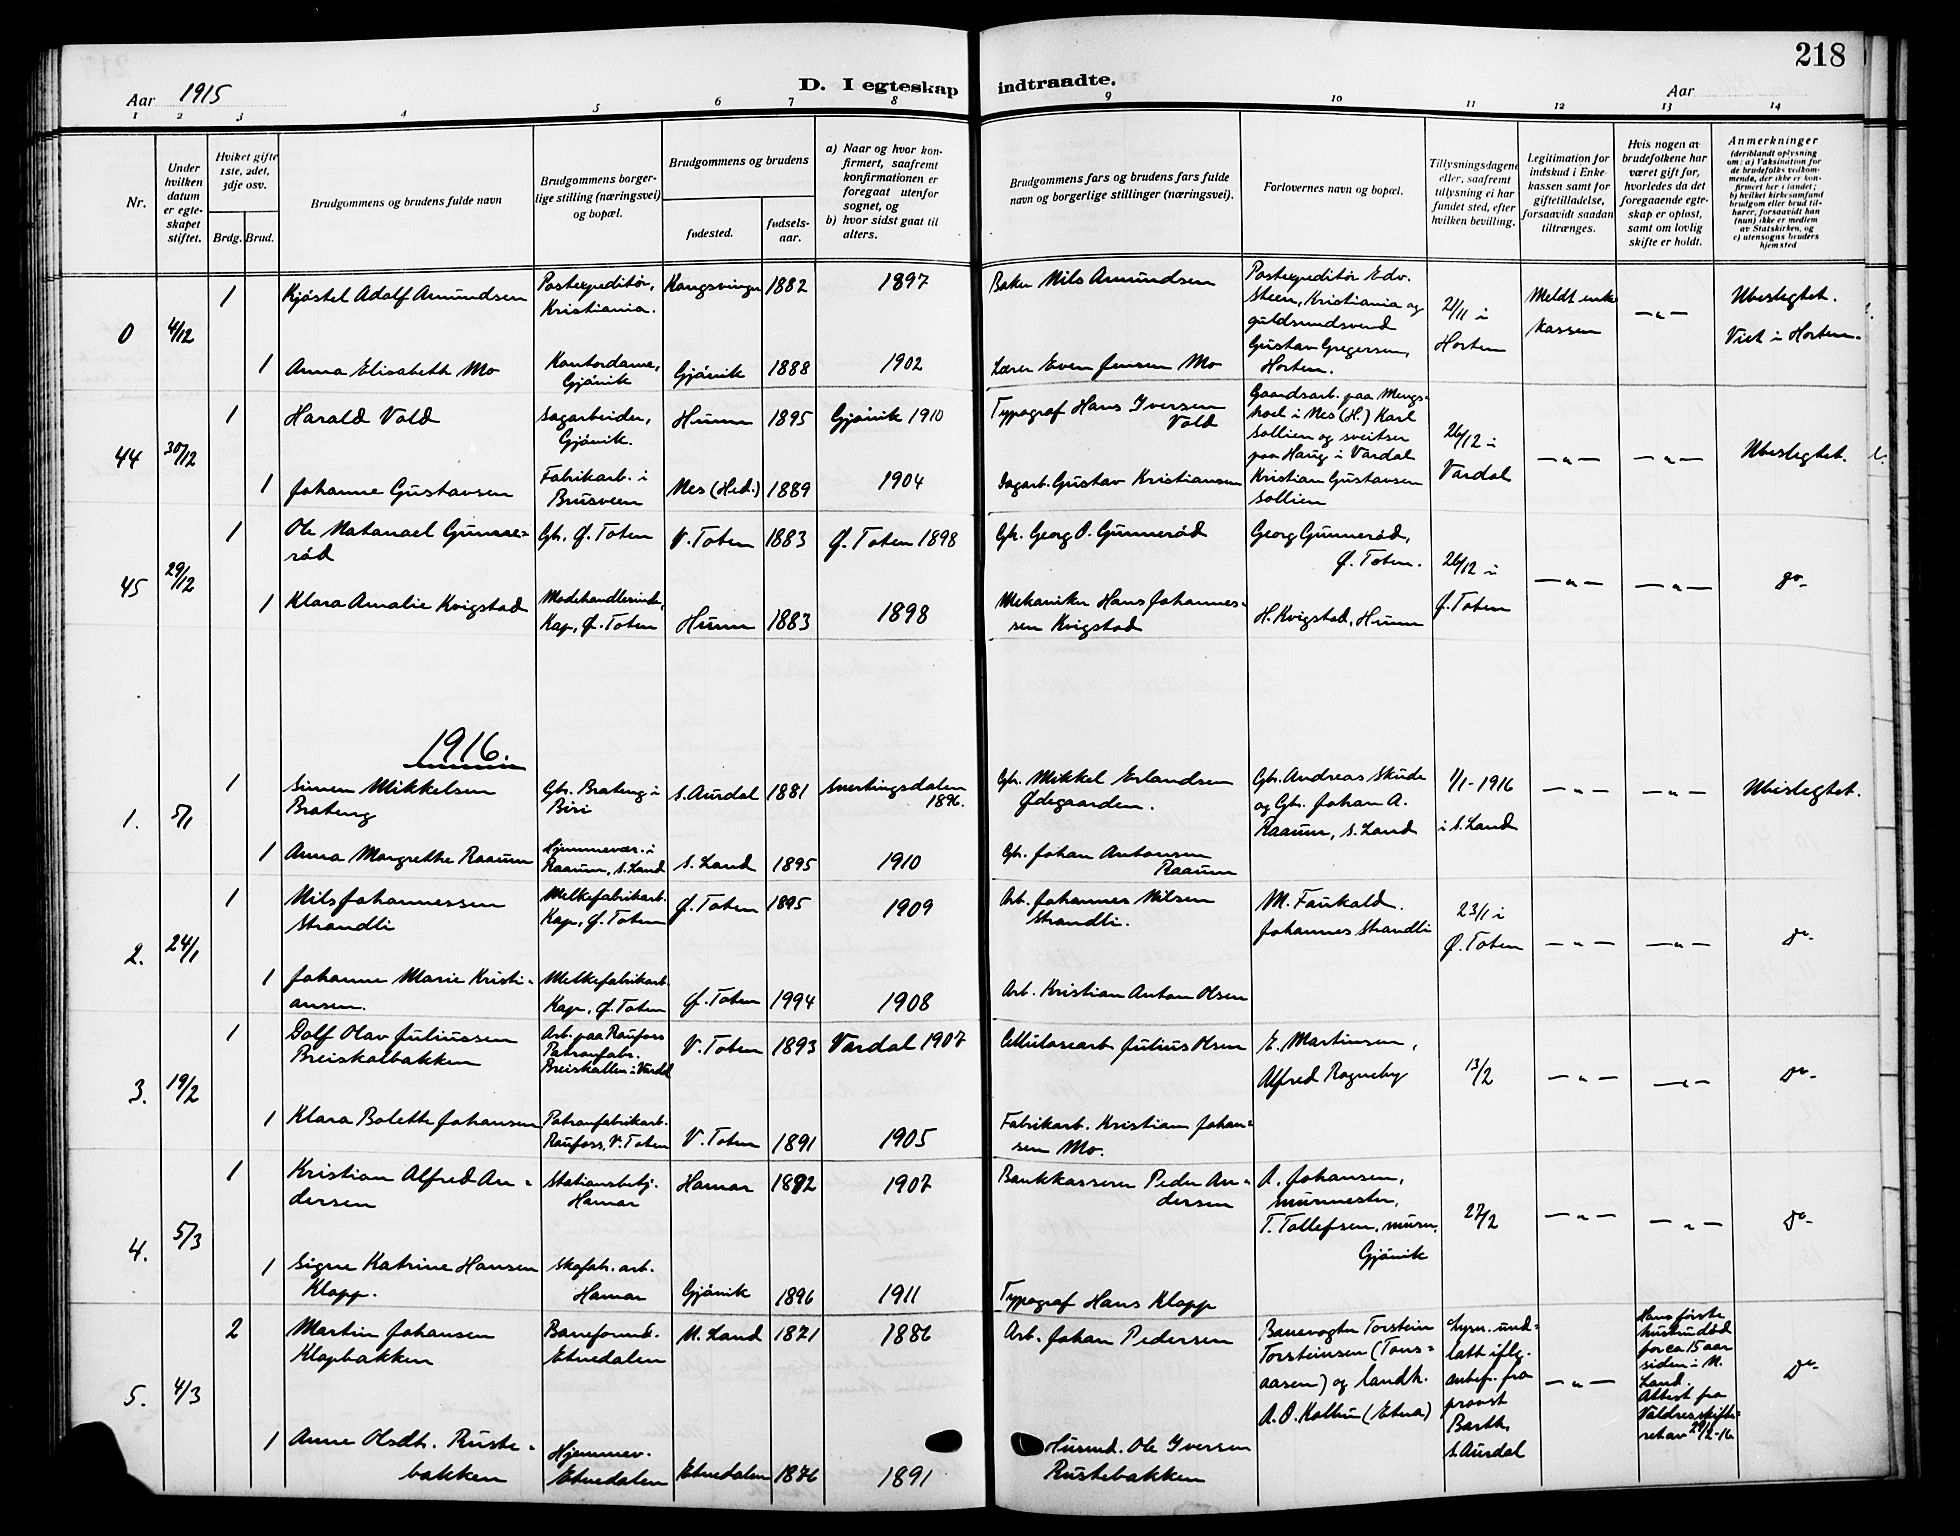 SAH, Vardal prestekontor, H/Ha/Hab/L0014: Klokkerbok nr. 14, 1911-1922, s. 218